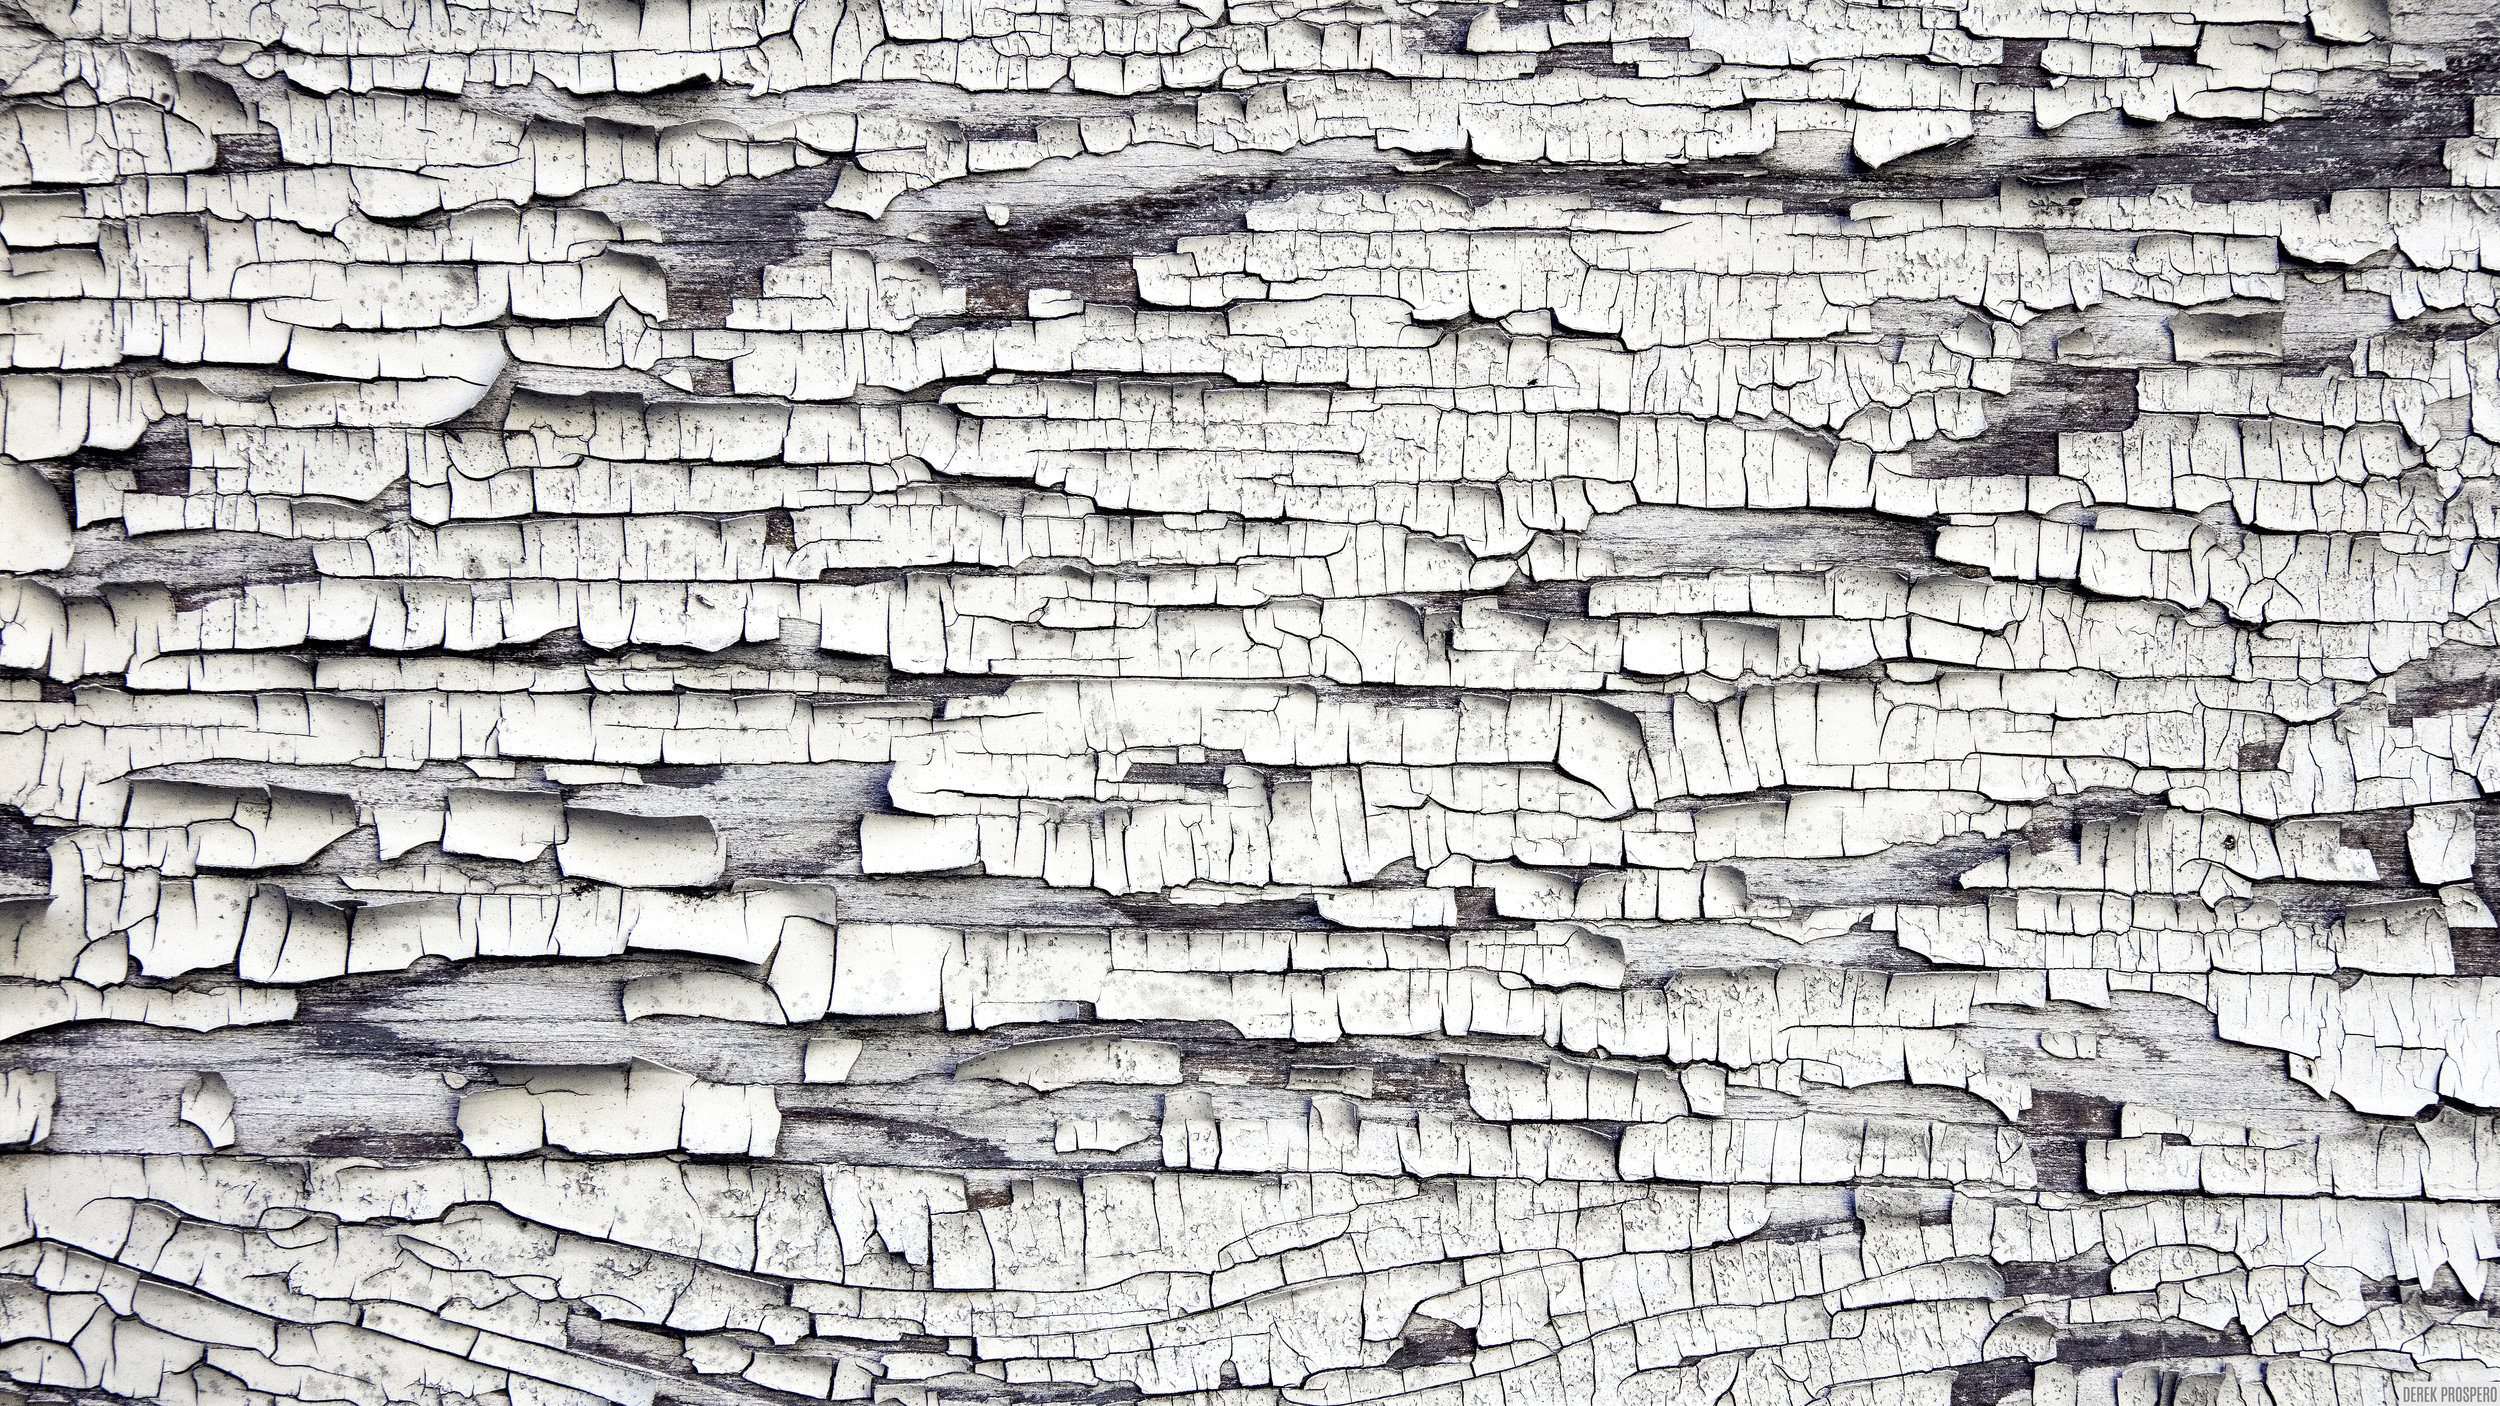 walls-008b.jpg